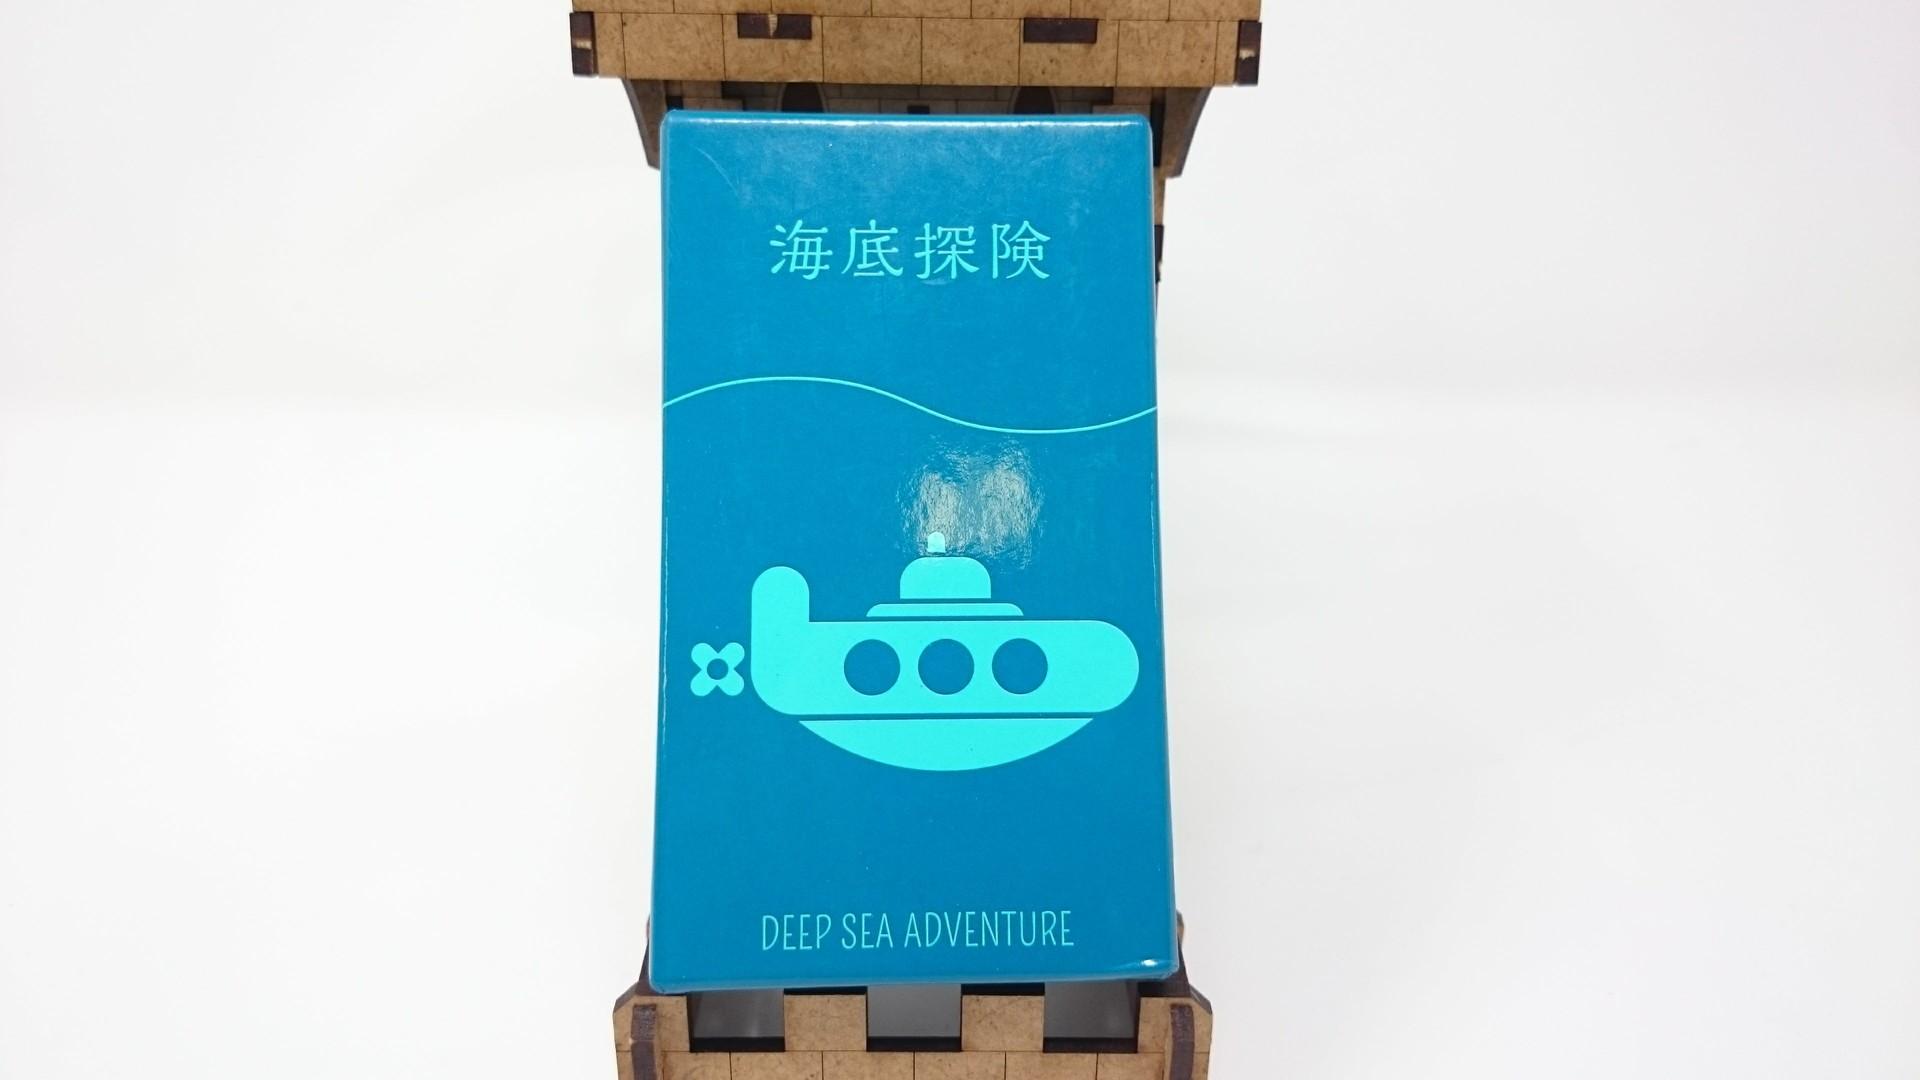 海底探検:DEEP SEA ADVENTURE